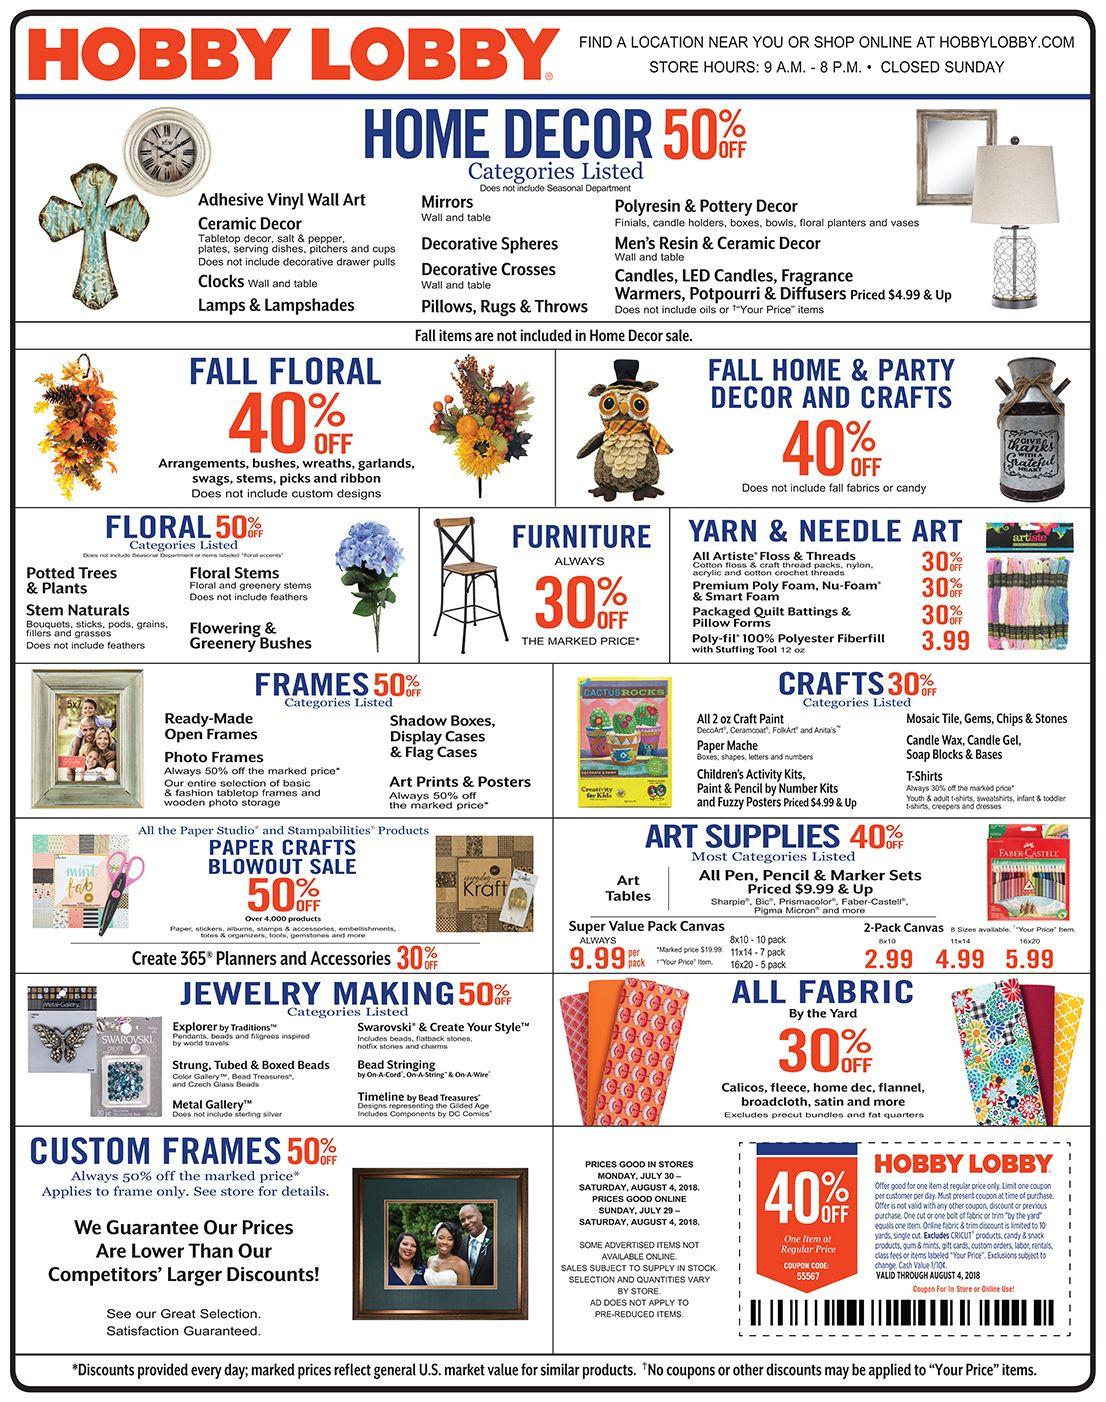 Hobby Lobby Weekly Ad Flyer January 20 - 26, 2019 | Weekly